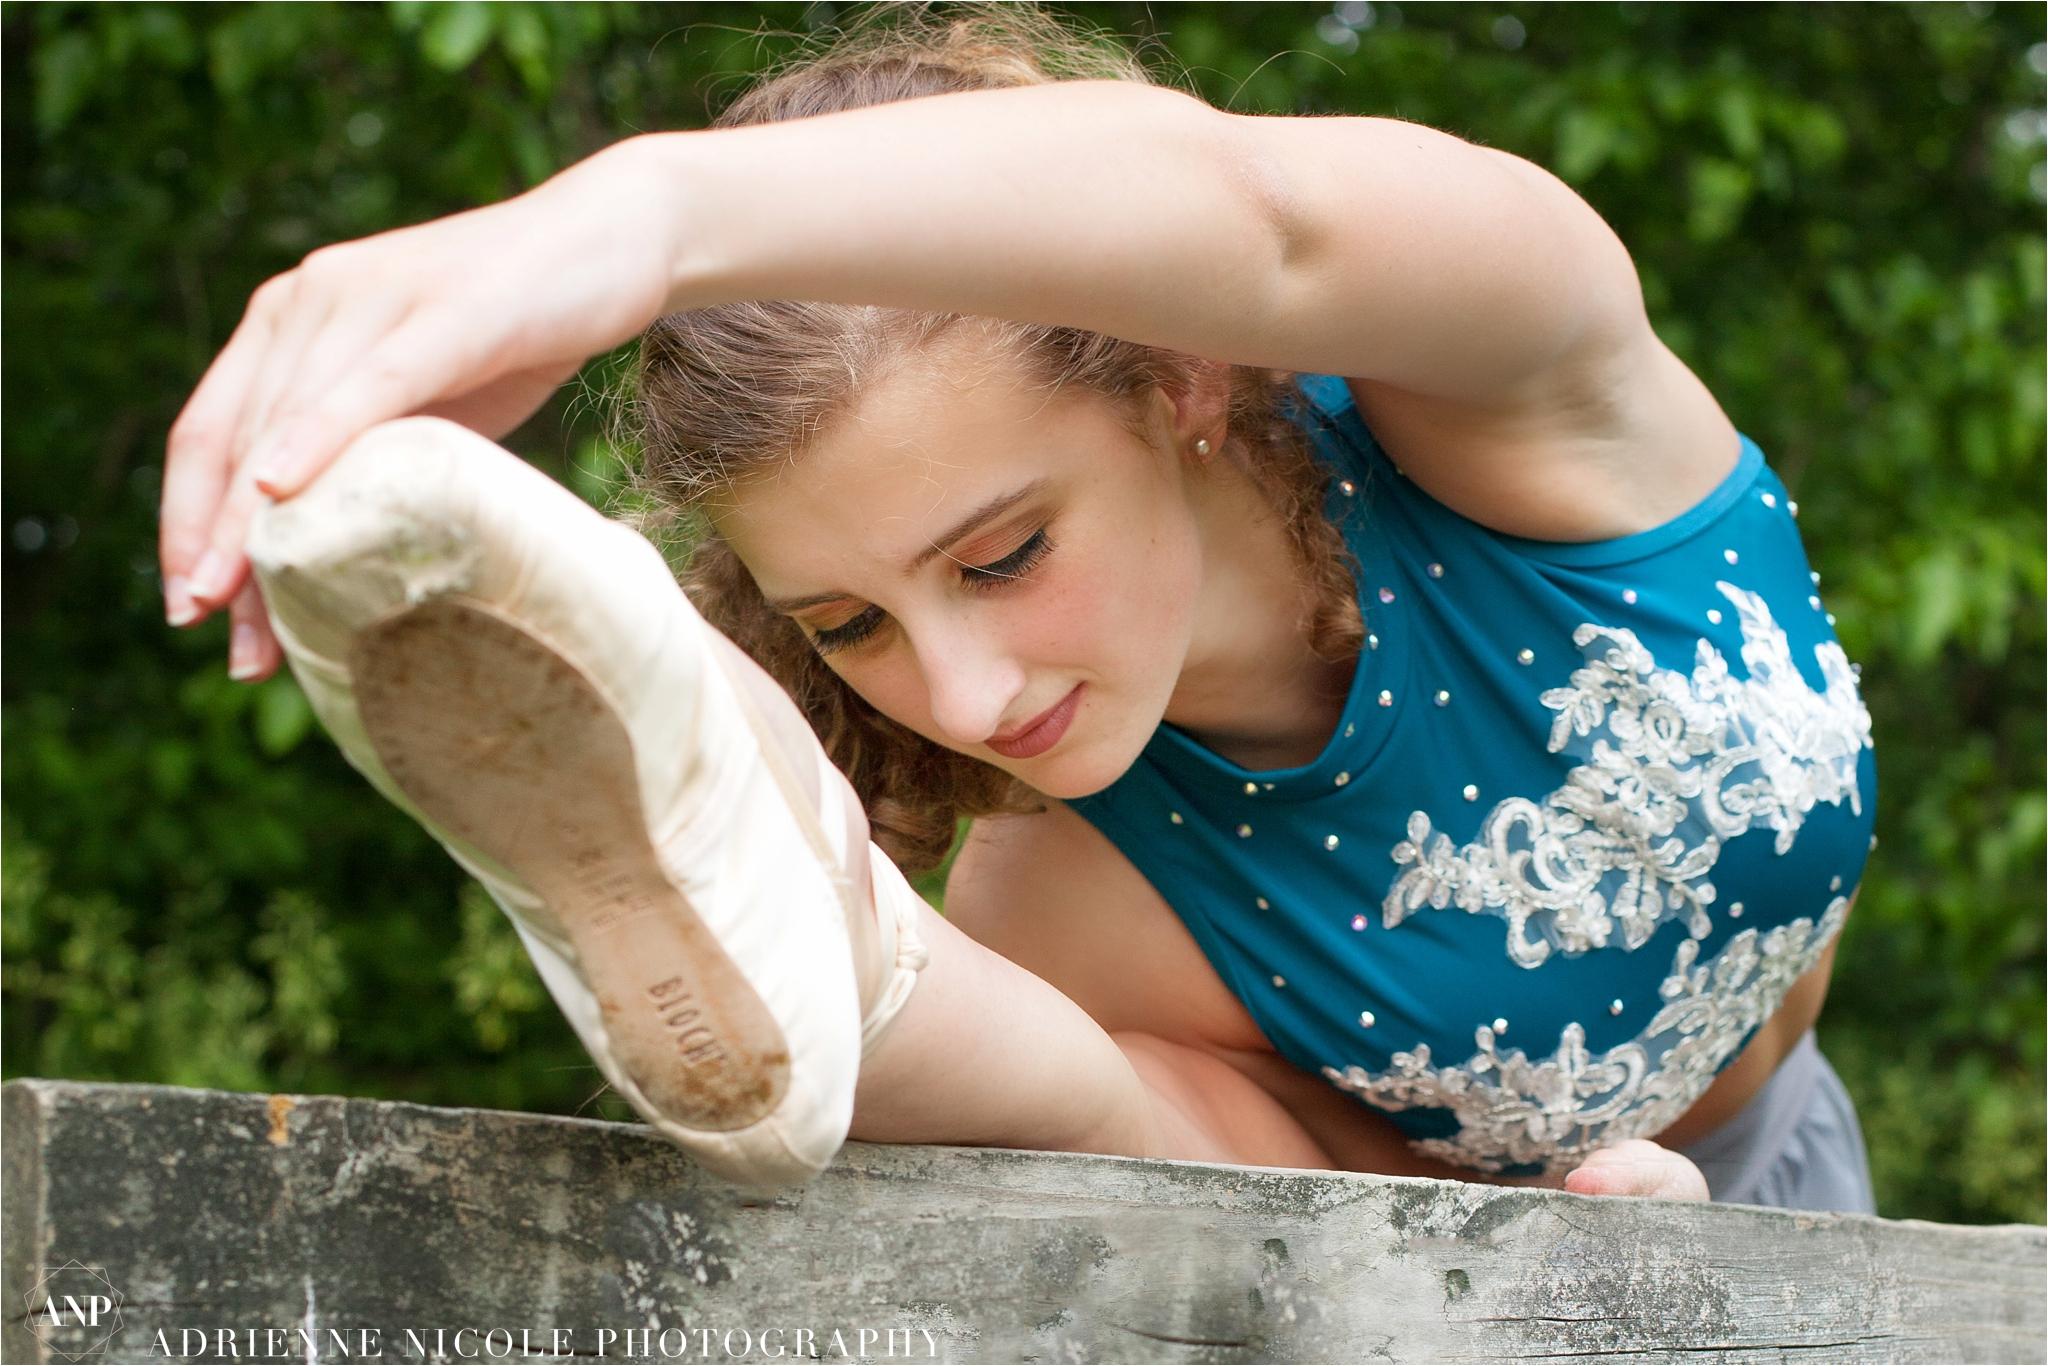 AdrienneNicolePhotography_0263.jpg